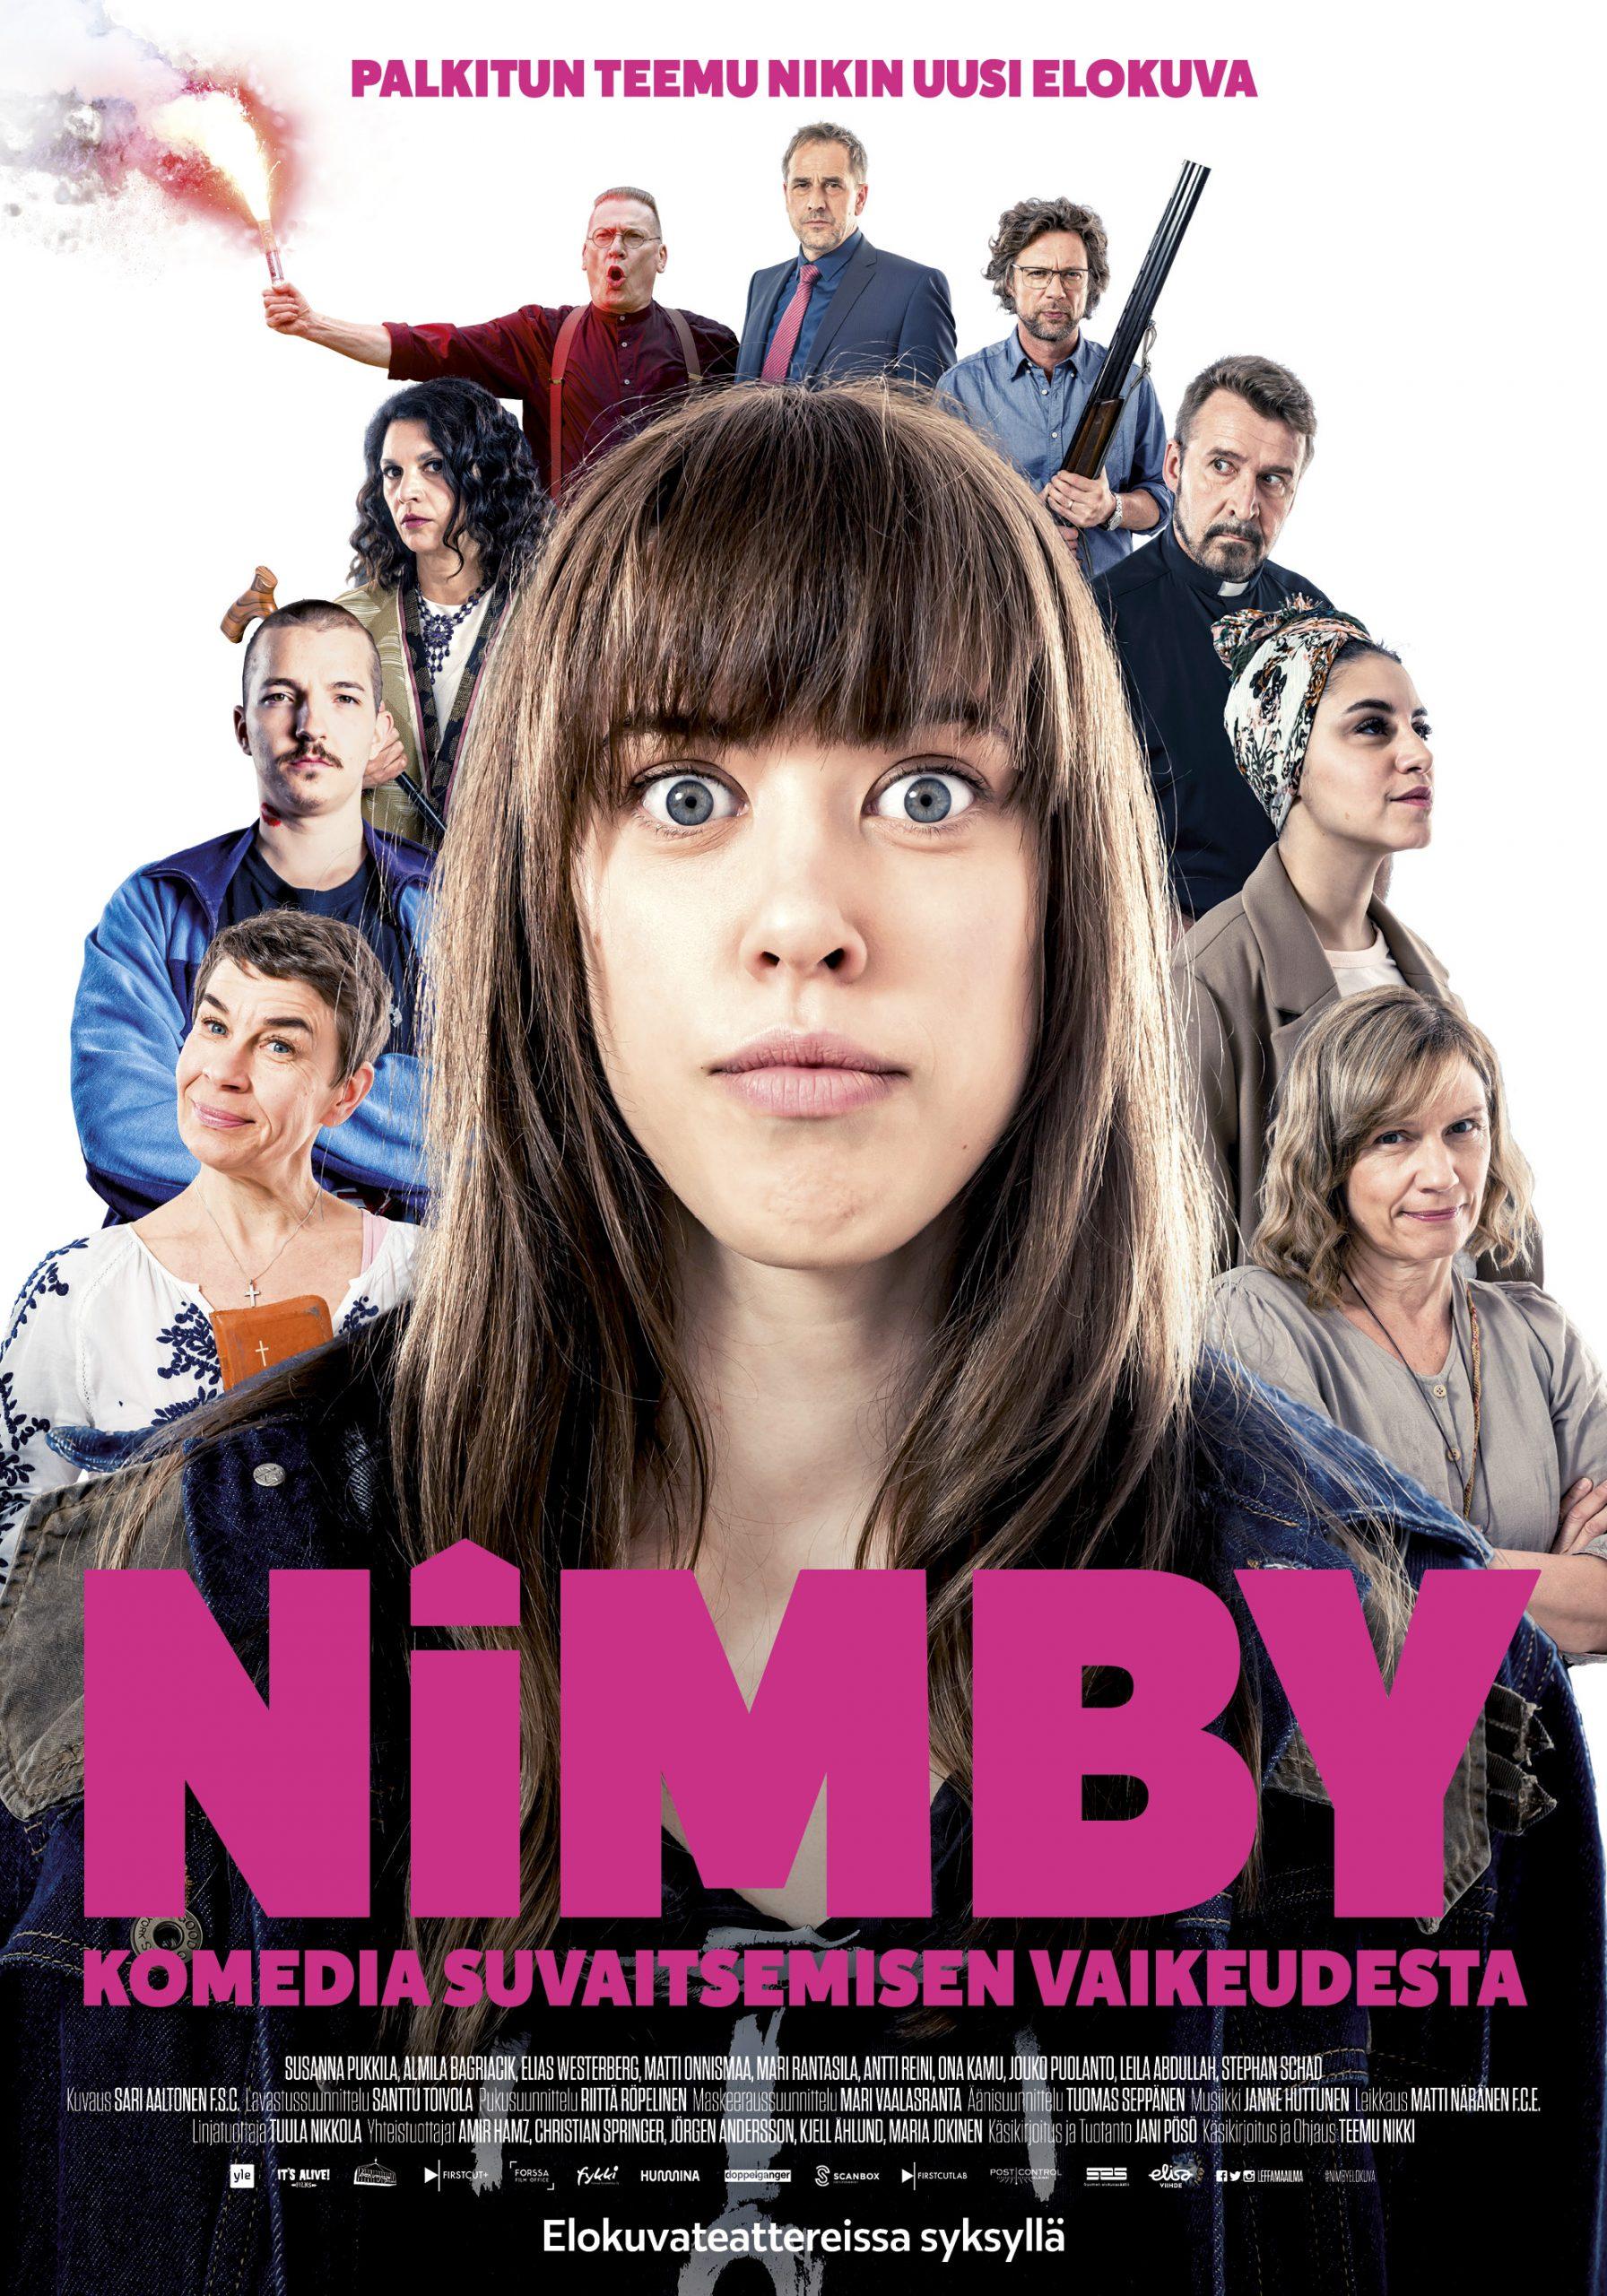 Finn Filmnapok – Nimby